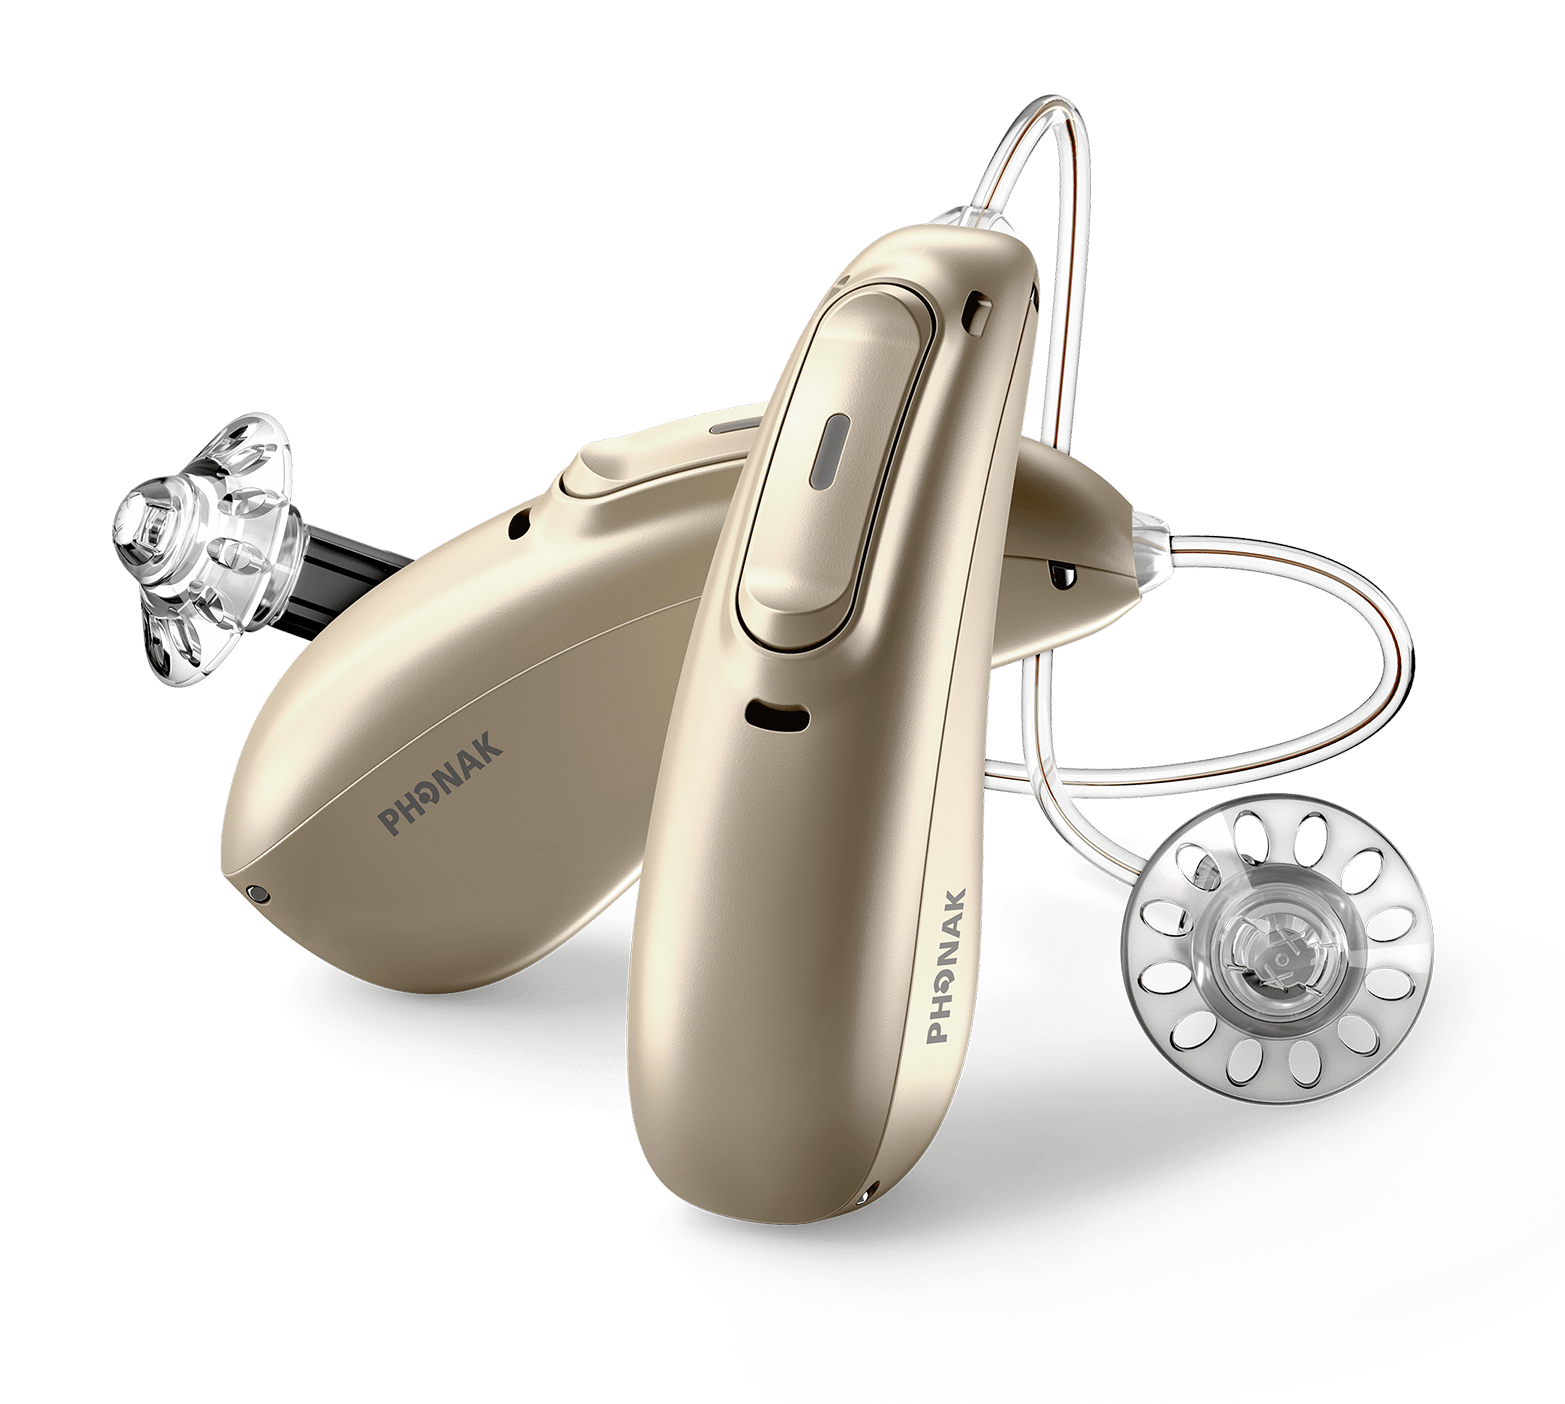 ric hearing aid device